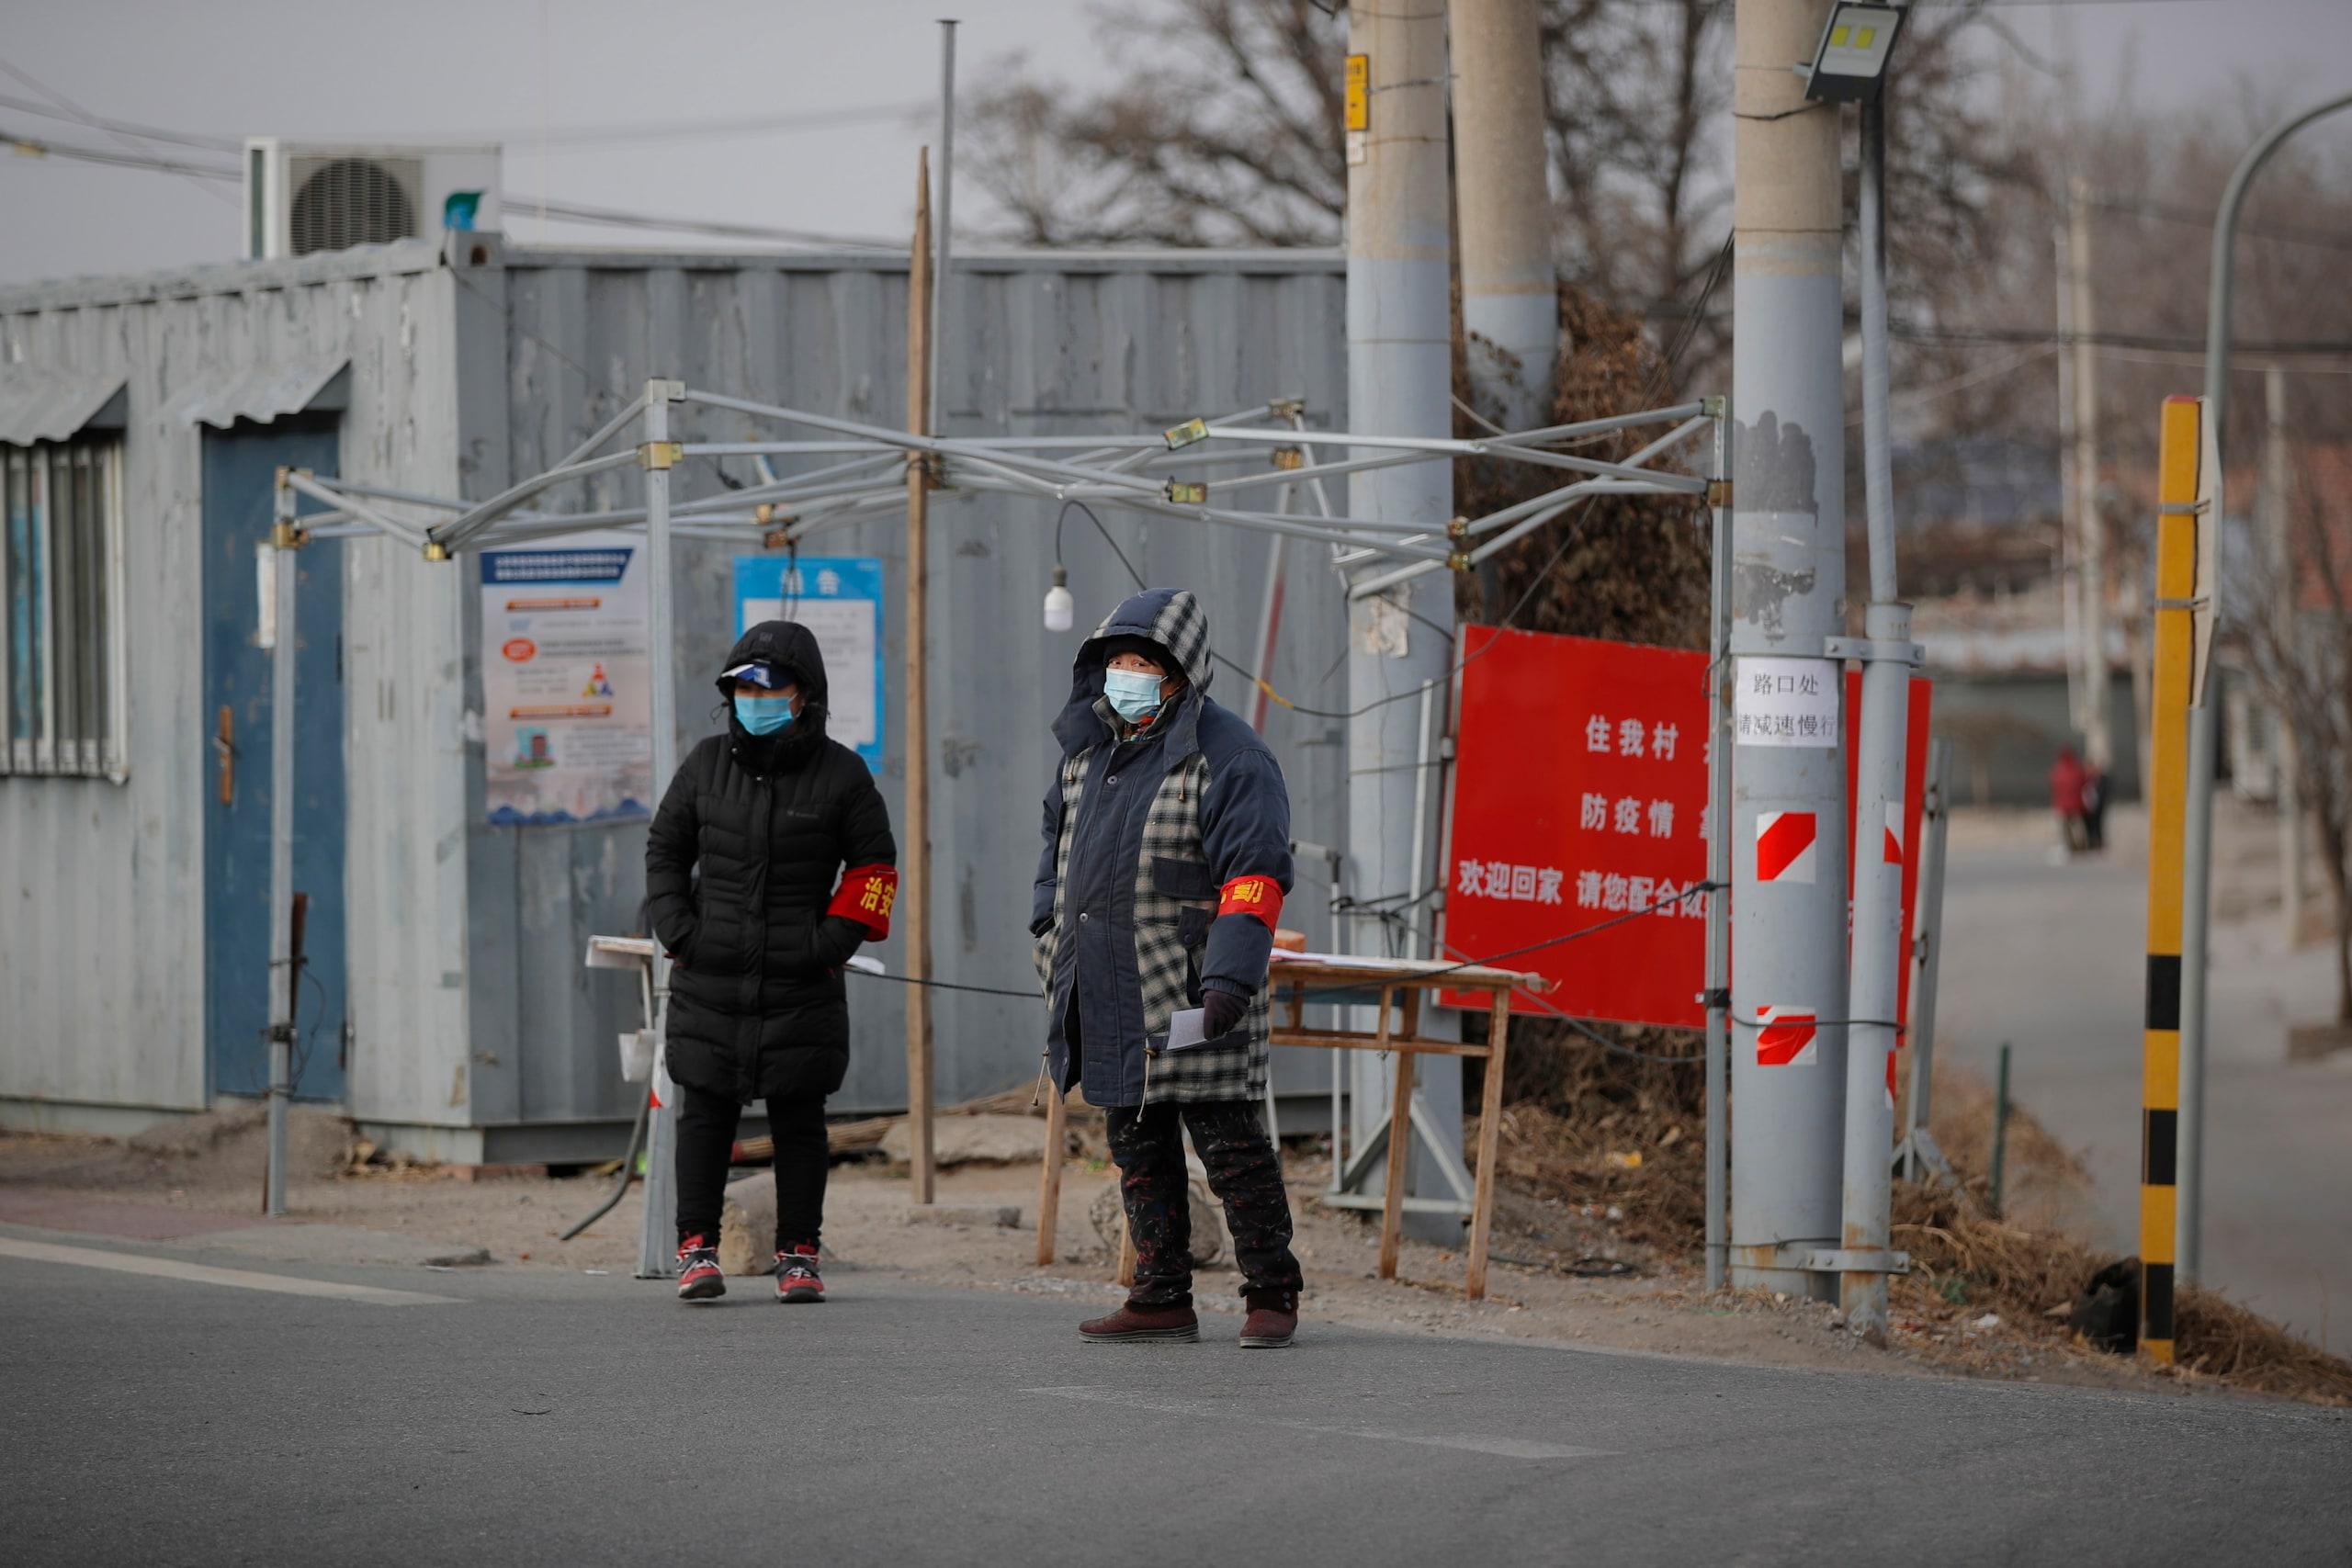 031811839 7cc21ee3 04ae 401b 8550 b2c4005e5e3b - Covid: Cina, un decesso per la prima volta dopo 8 mesi